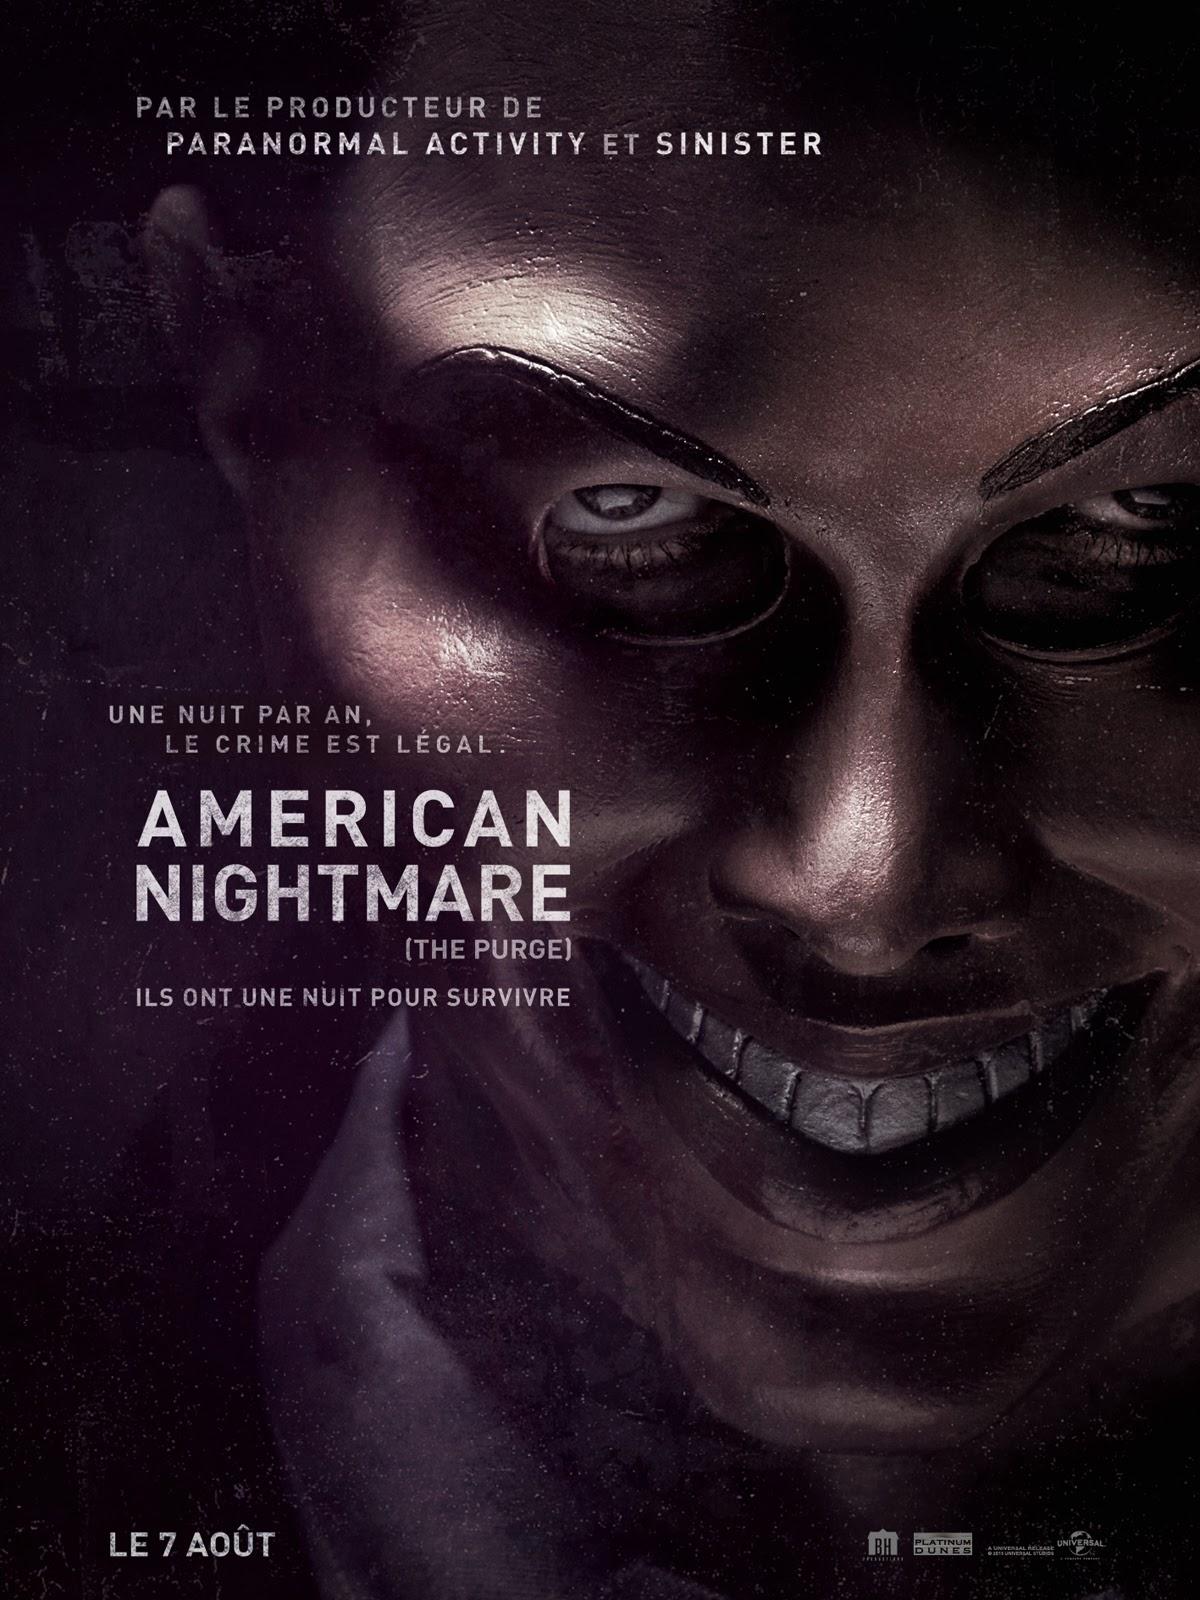 http://cinemadefreddy.files.wordpress.com/2013/08/americannightmare.jpg